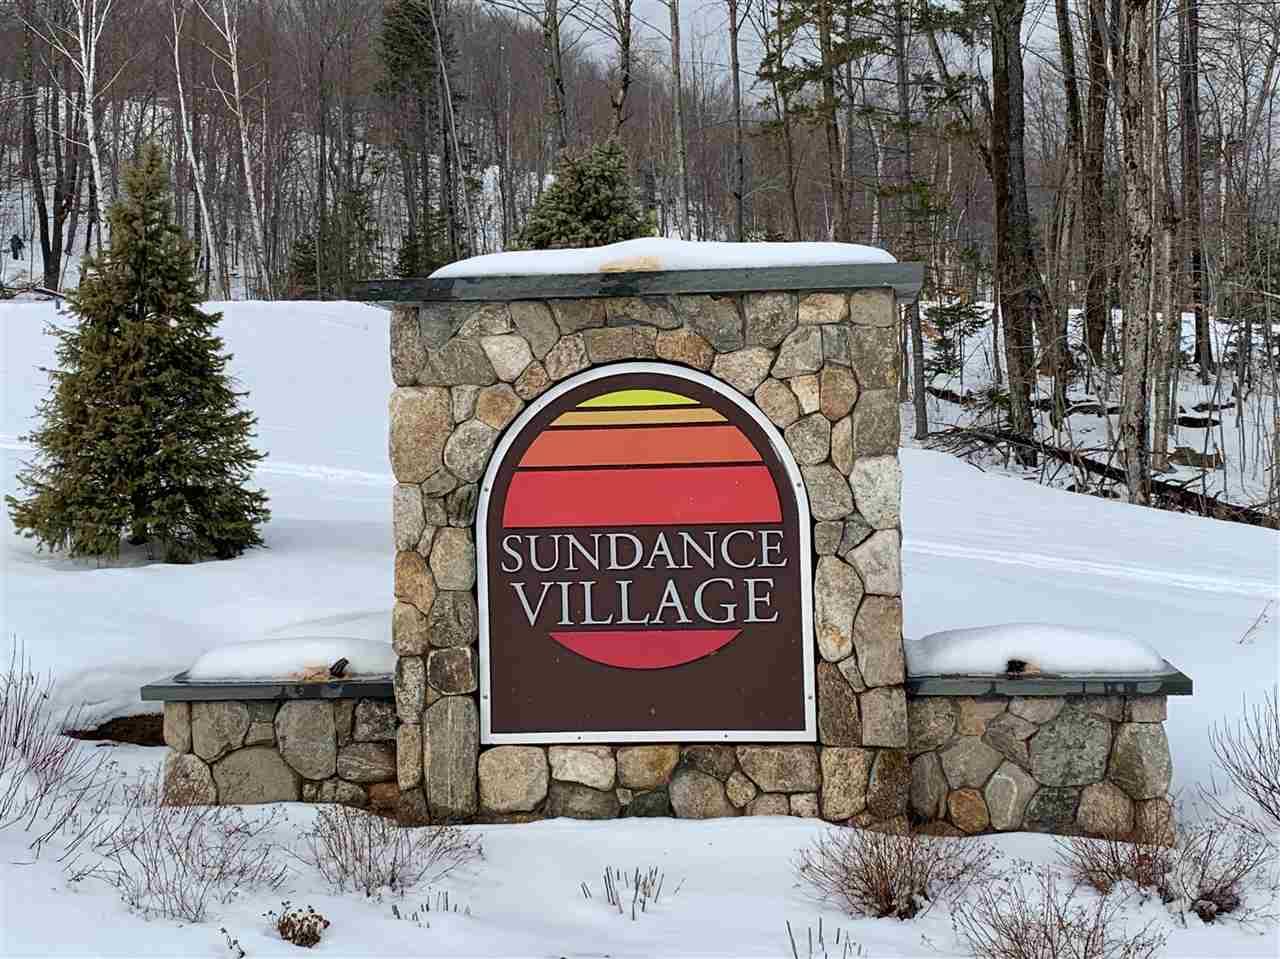 Mount-Snow-Real-Estate-4500435-1